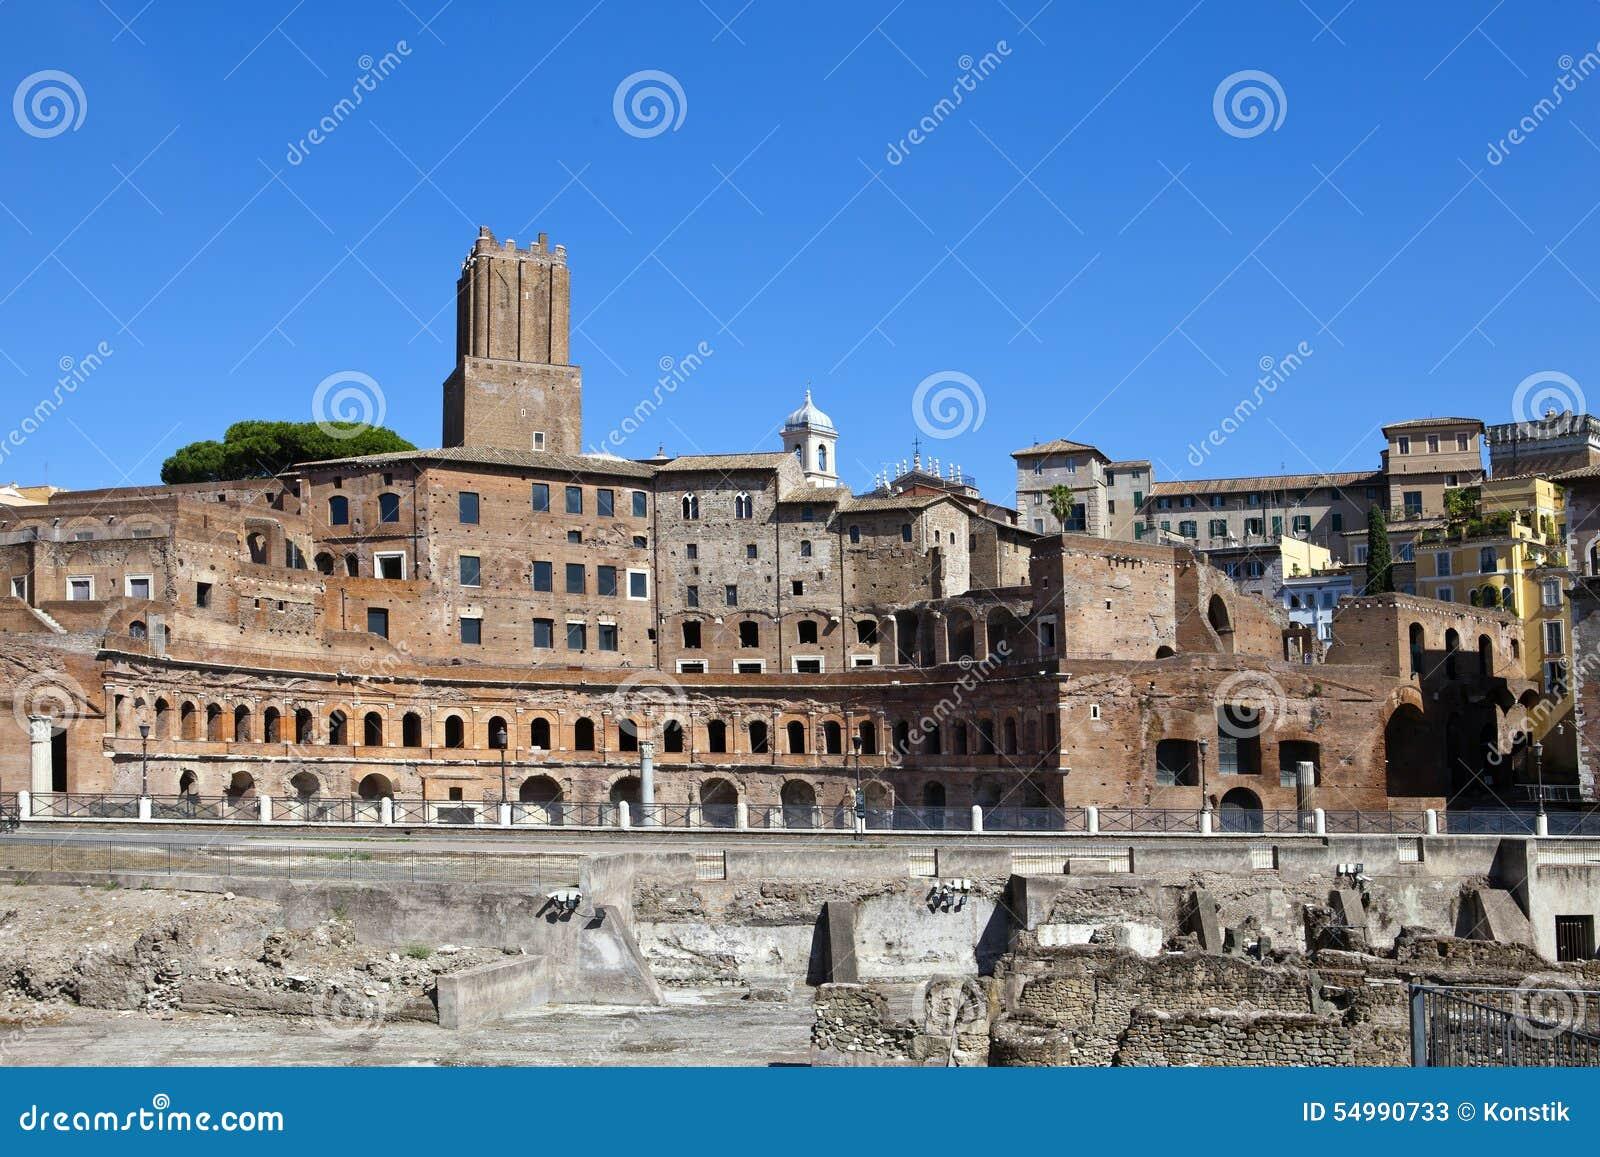 Italy roma ruínas do fórum de Trajan